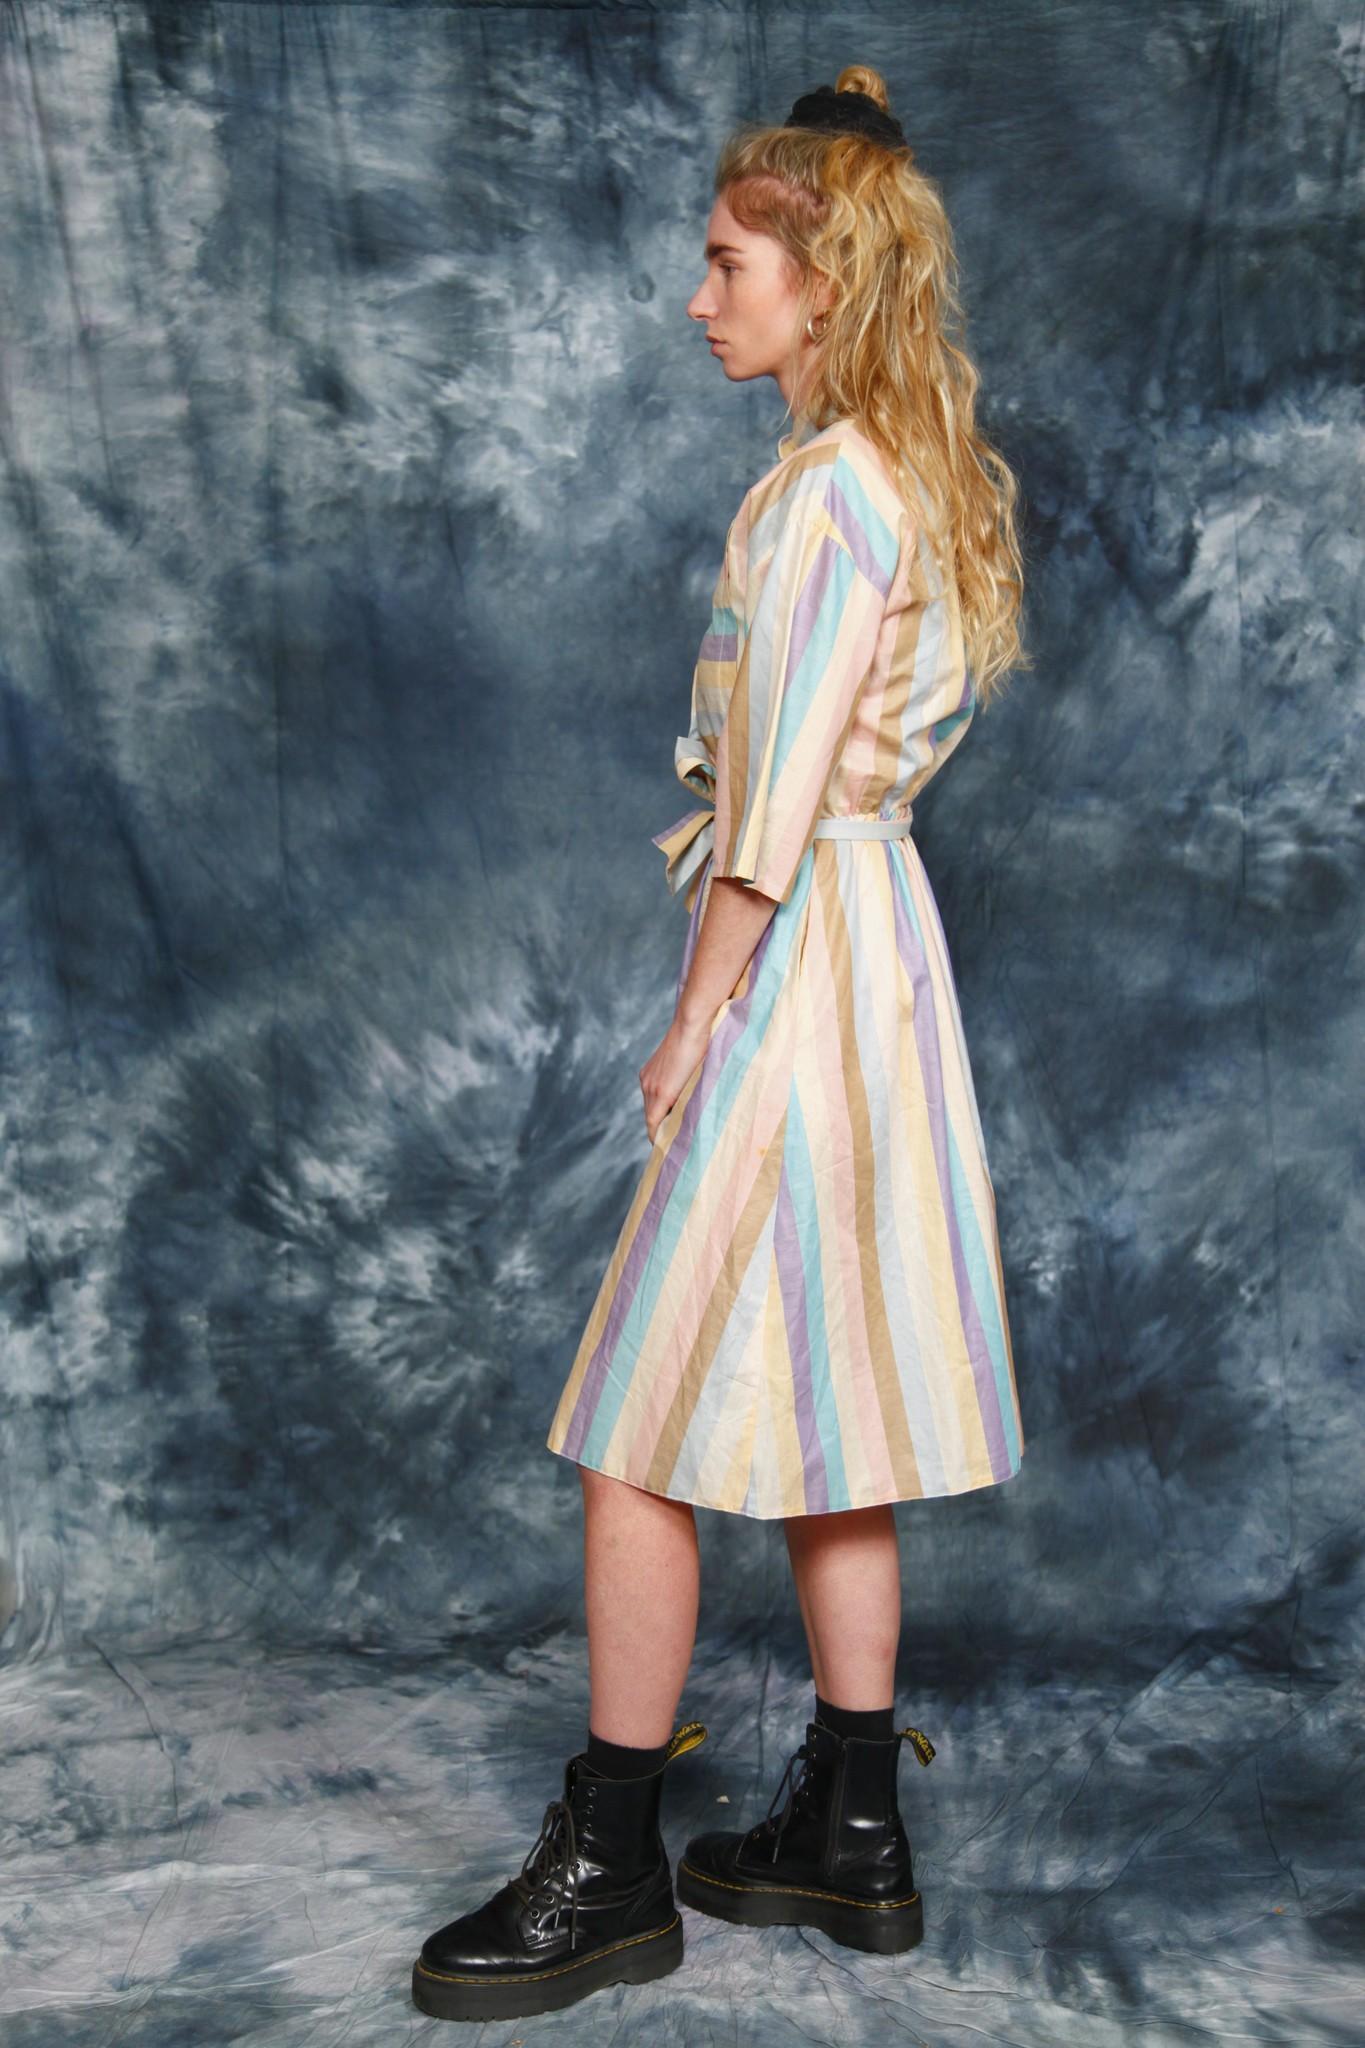 Striped 80s dress